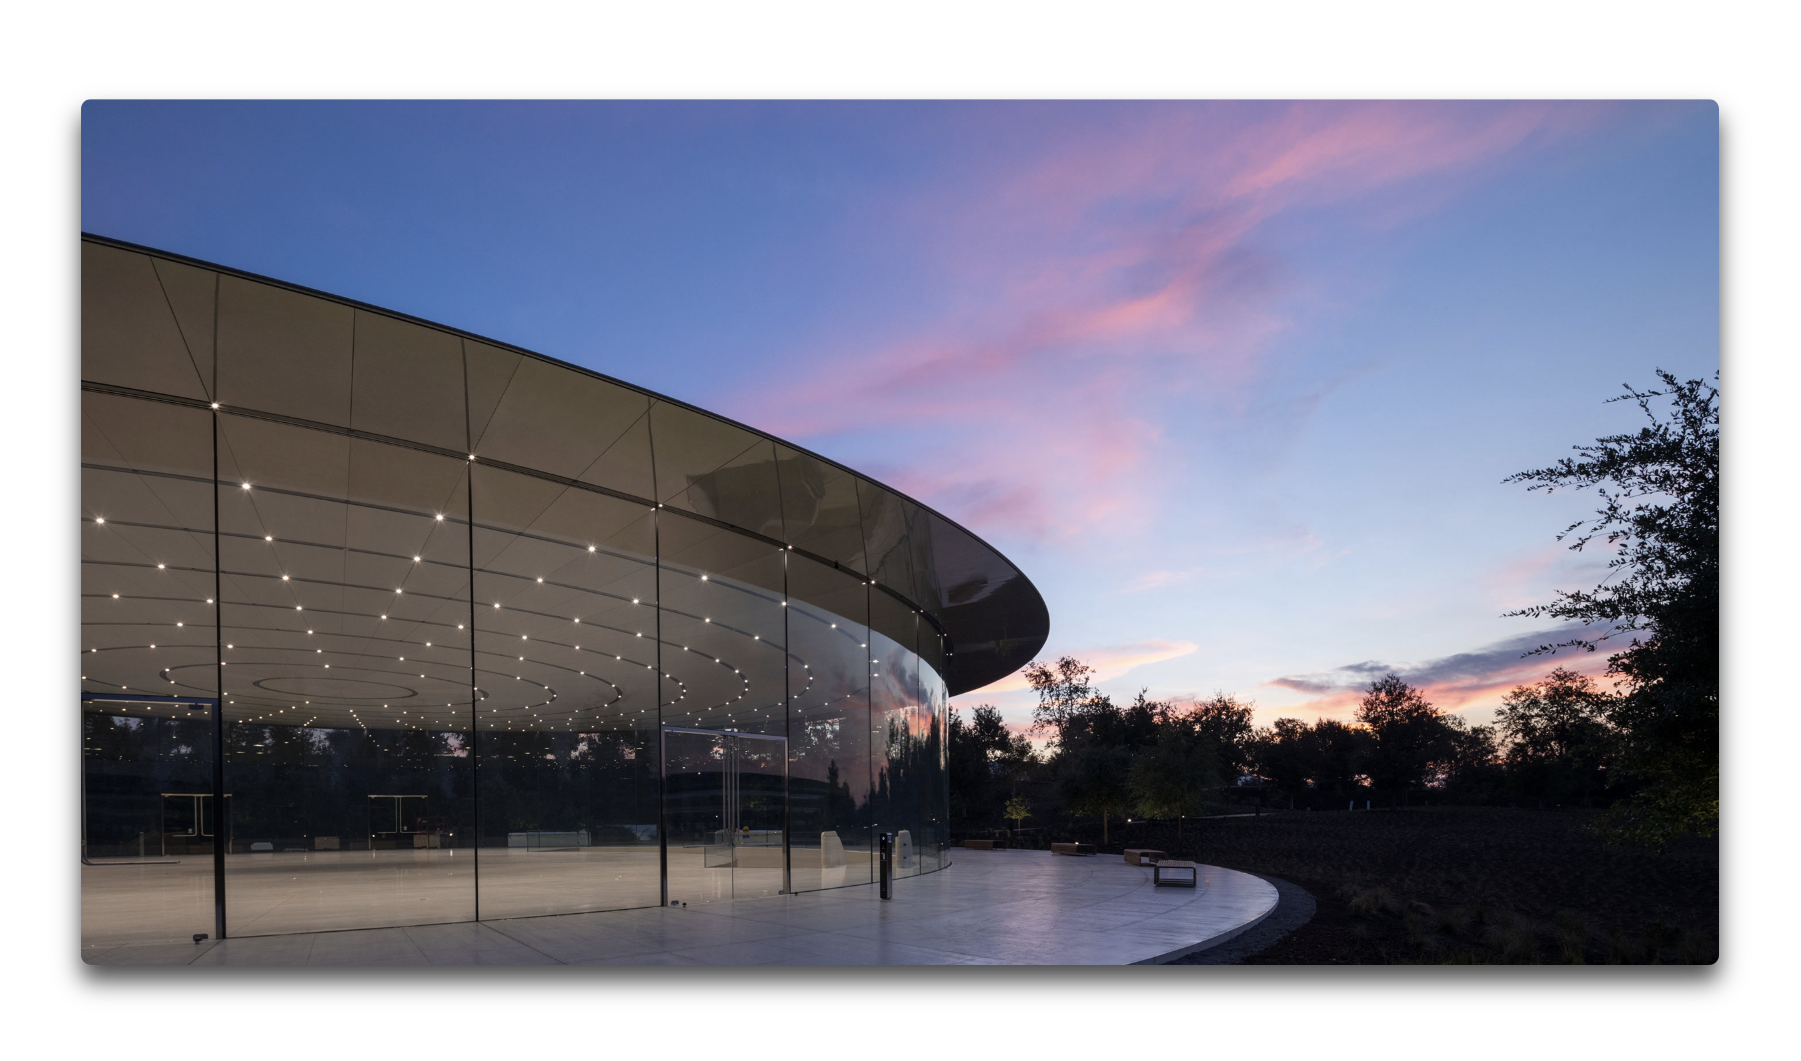 Apple、3月25日にSteve Jobs Theaterにおいてイベントを開催予定